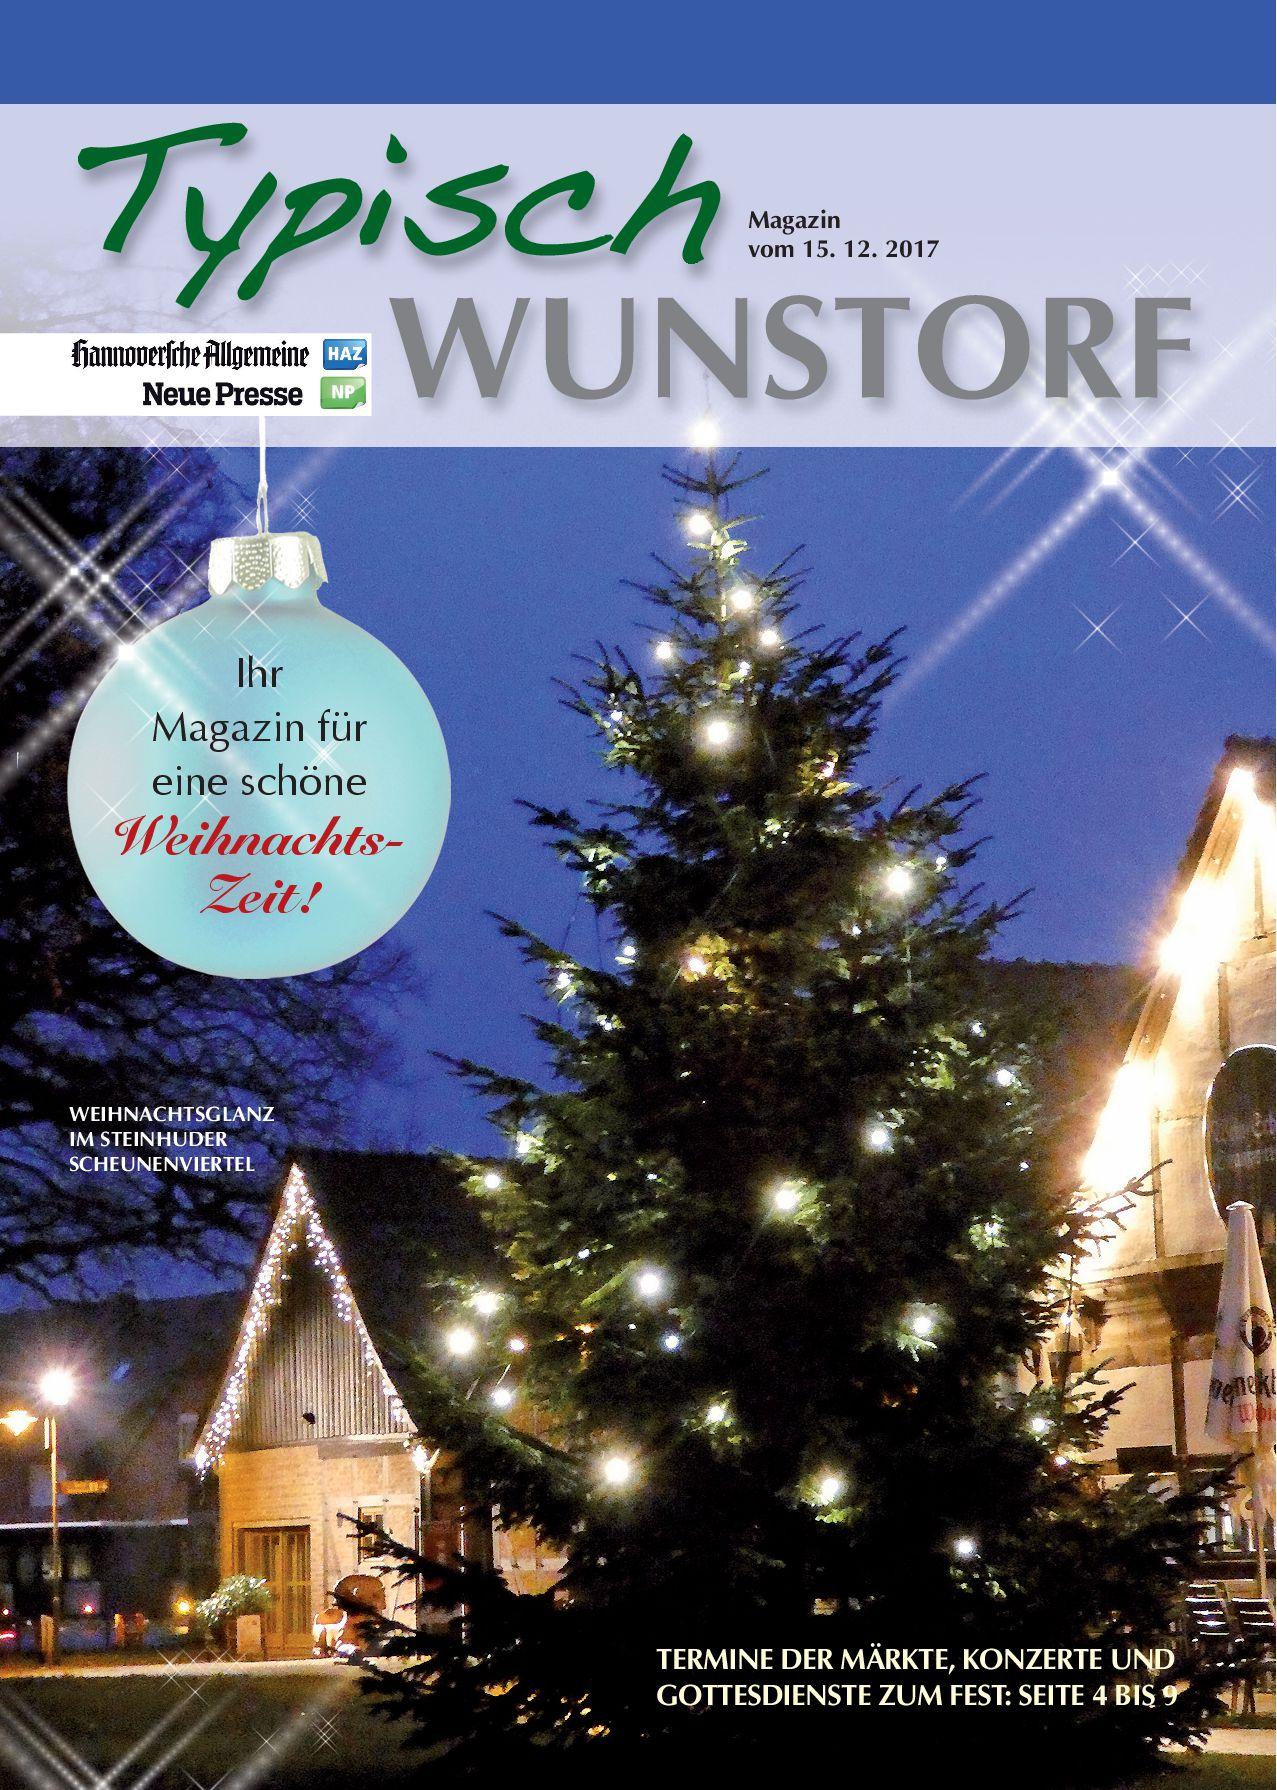 wunstorf-vom-15-12-2017